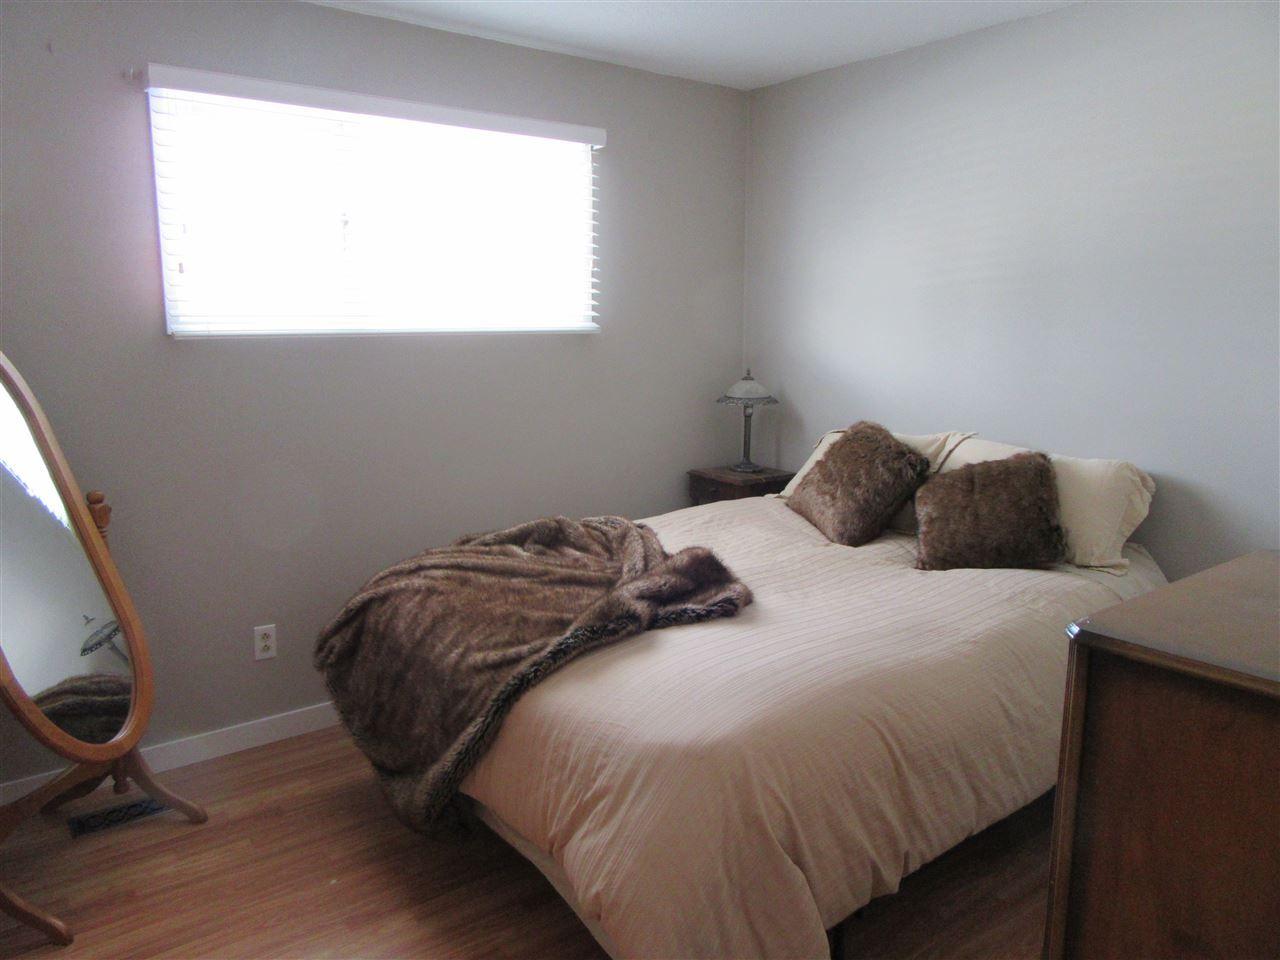 Photo 11: Photos: 522 RADCLIFFE Drive: Quinson House for sale (PG City West (Zone 71))  : MLS®# R2433646